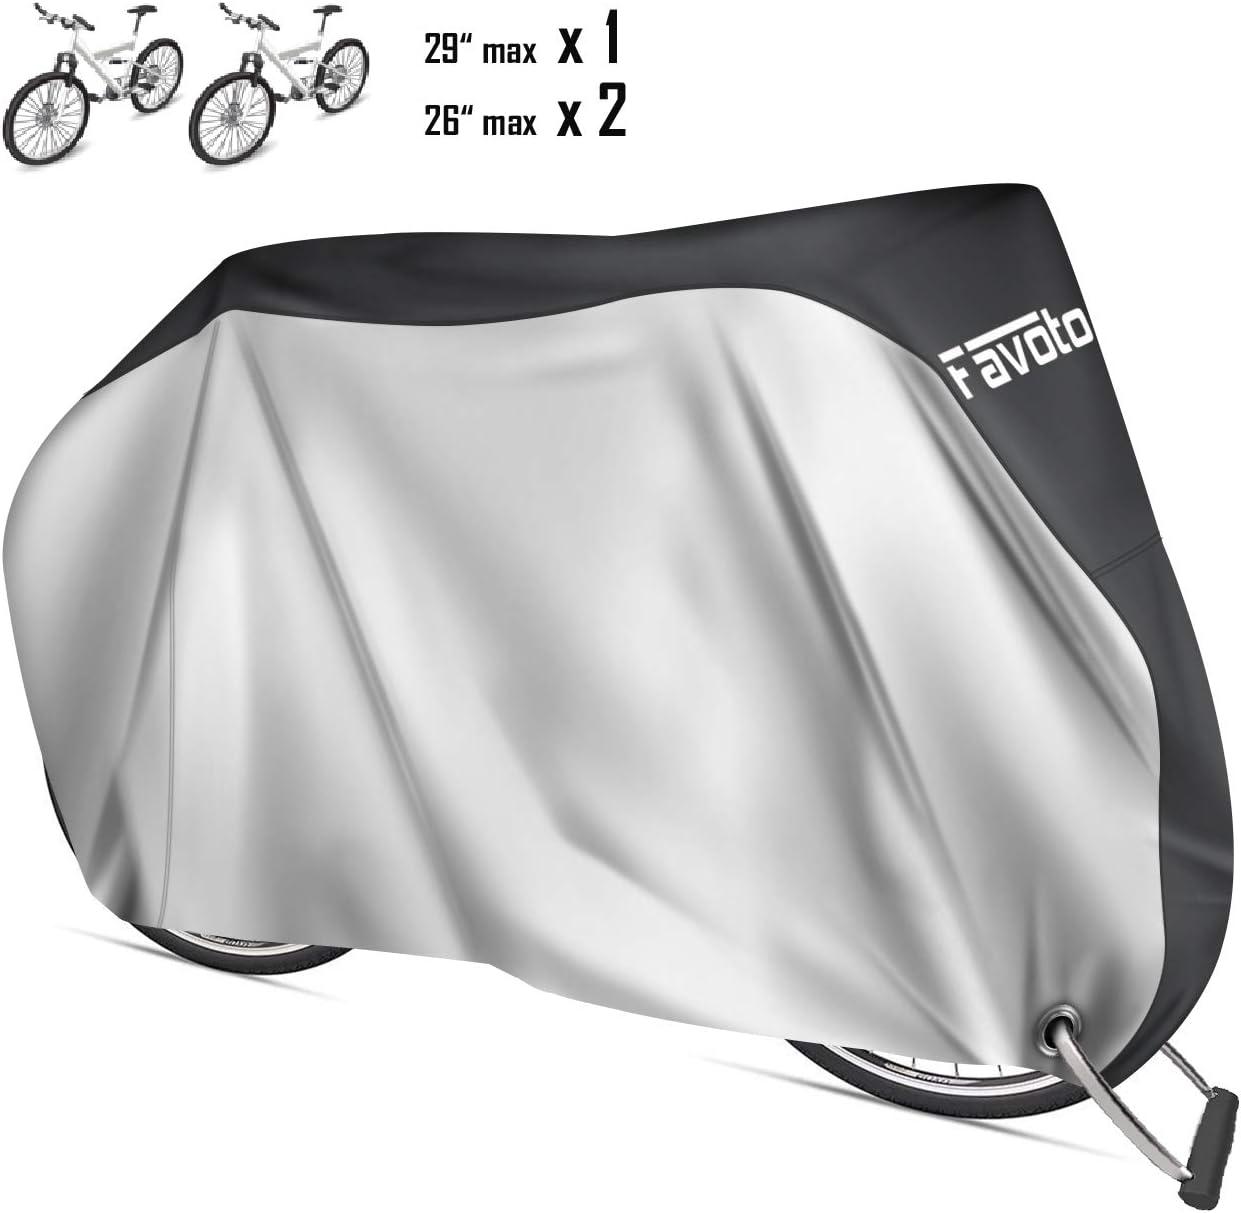 Favoto Funda para Bicicleta Exterior 210D Cubierta Protector al Aire Libre contra Lluvia Sol Polvo para Montaña Carretera XL